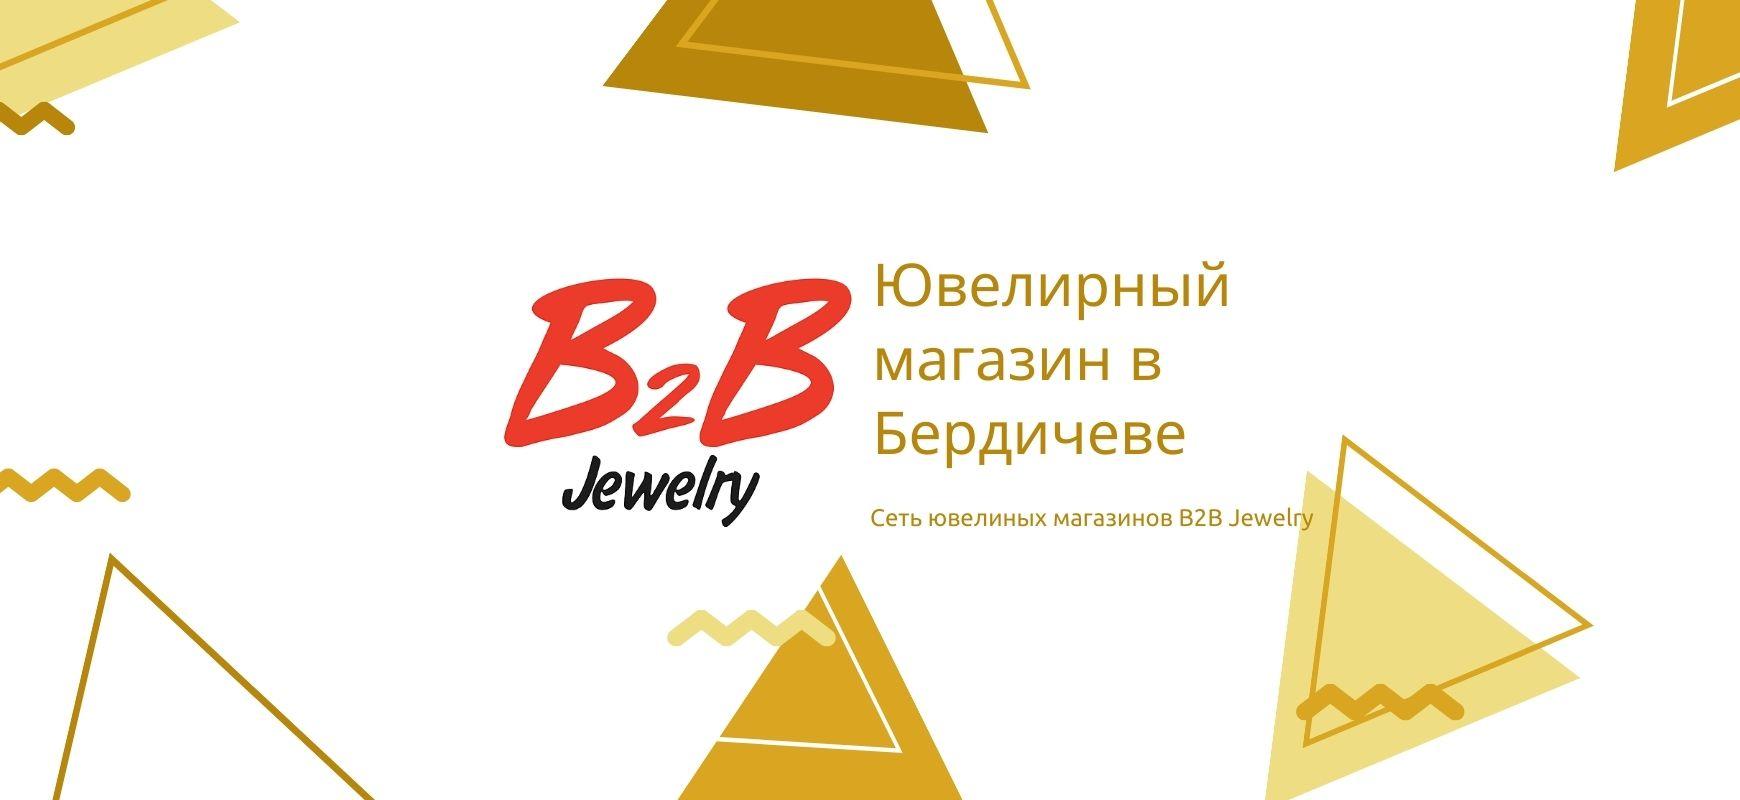 B2B JEWELRY БЕРДИЧЕВ